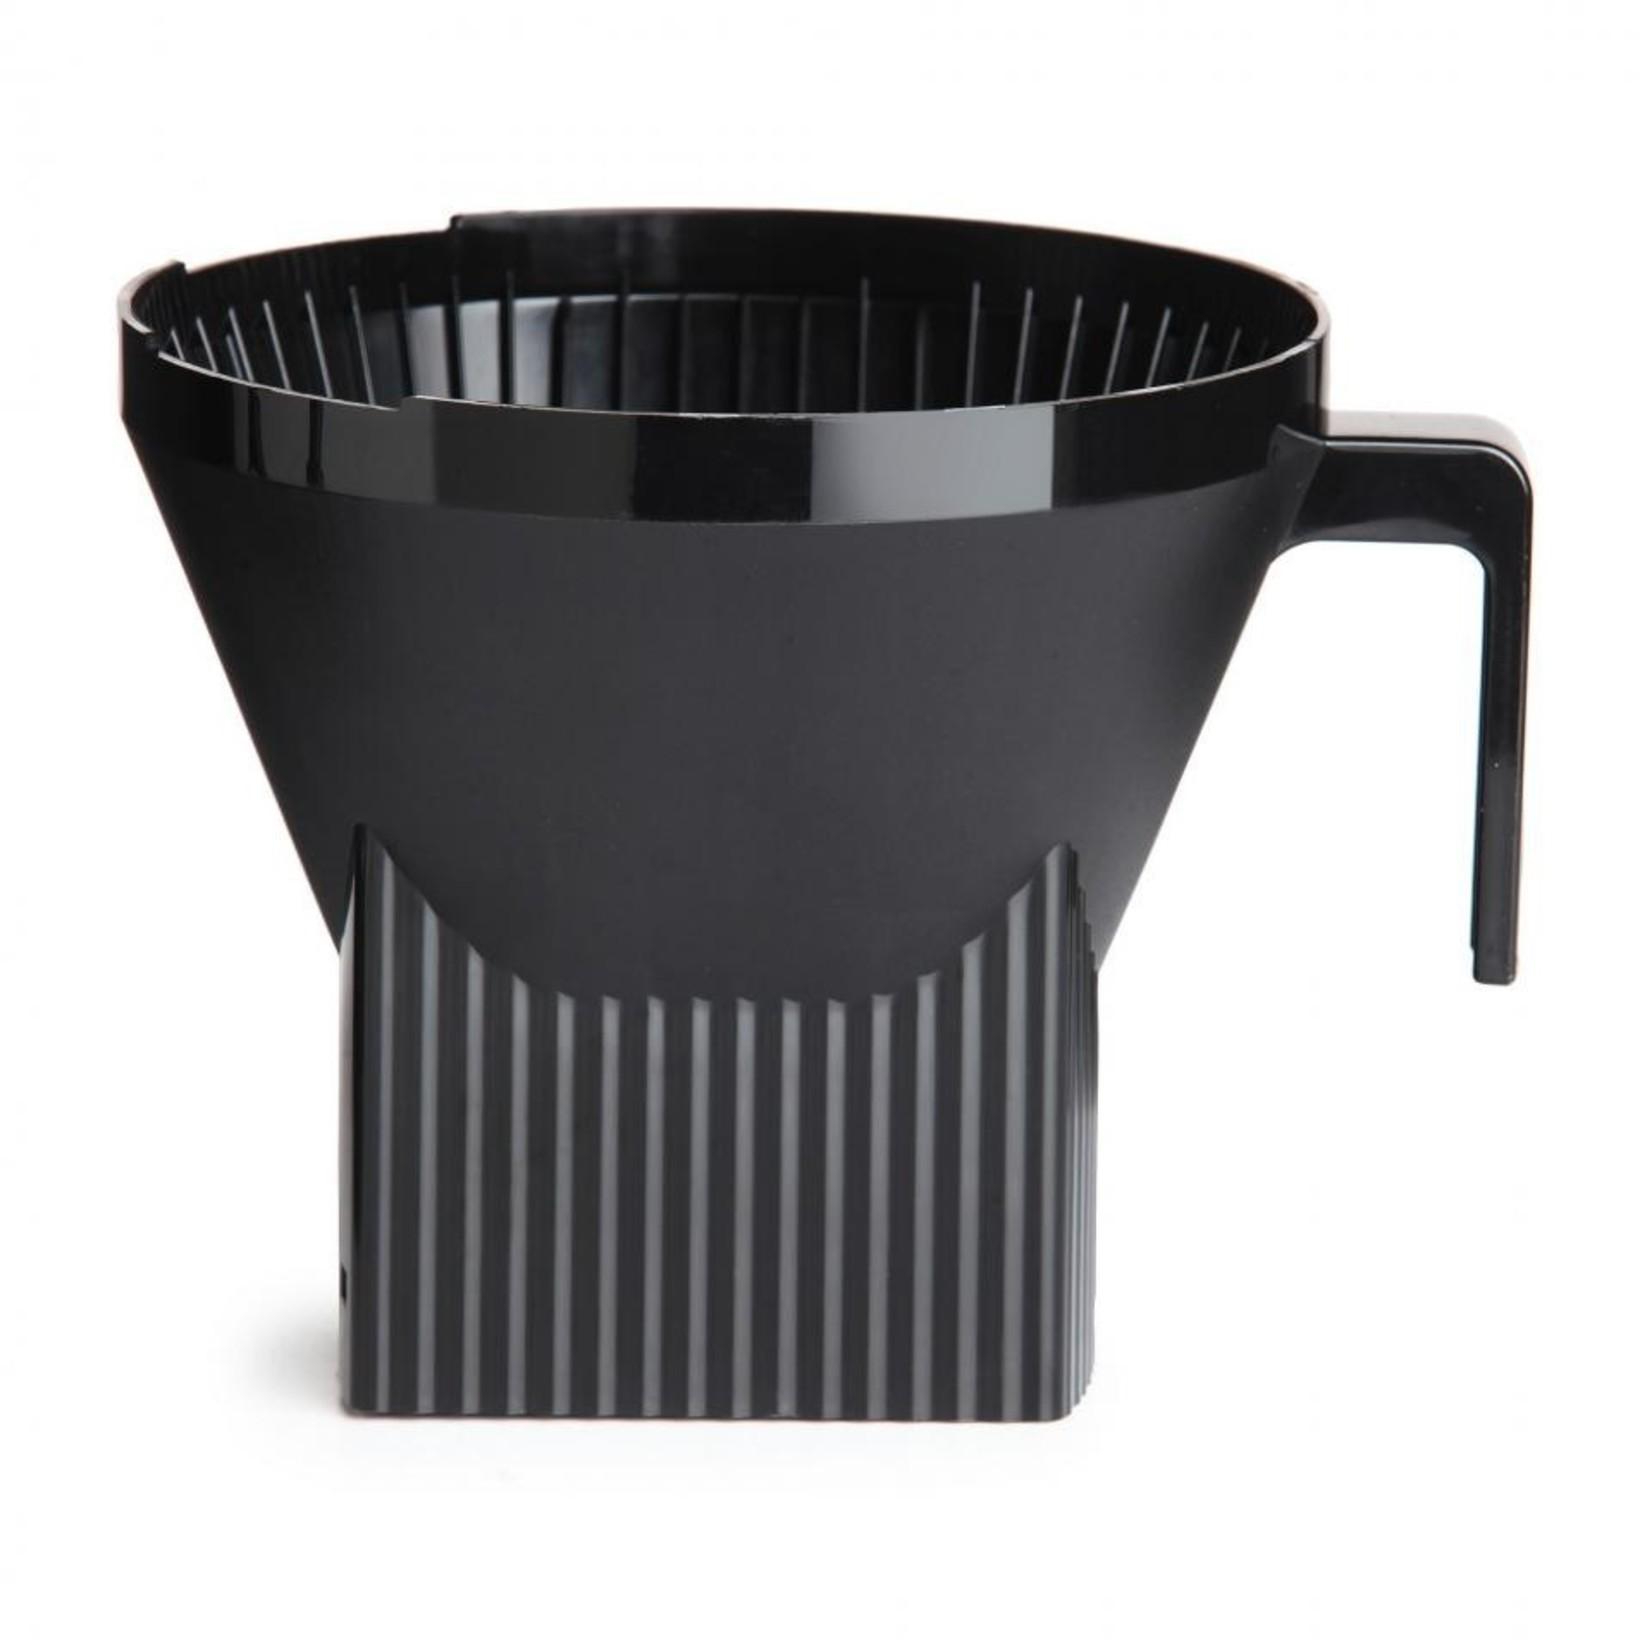 Douwe Egberts Moccamaster koffiefilterhouder KBG